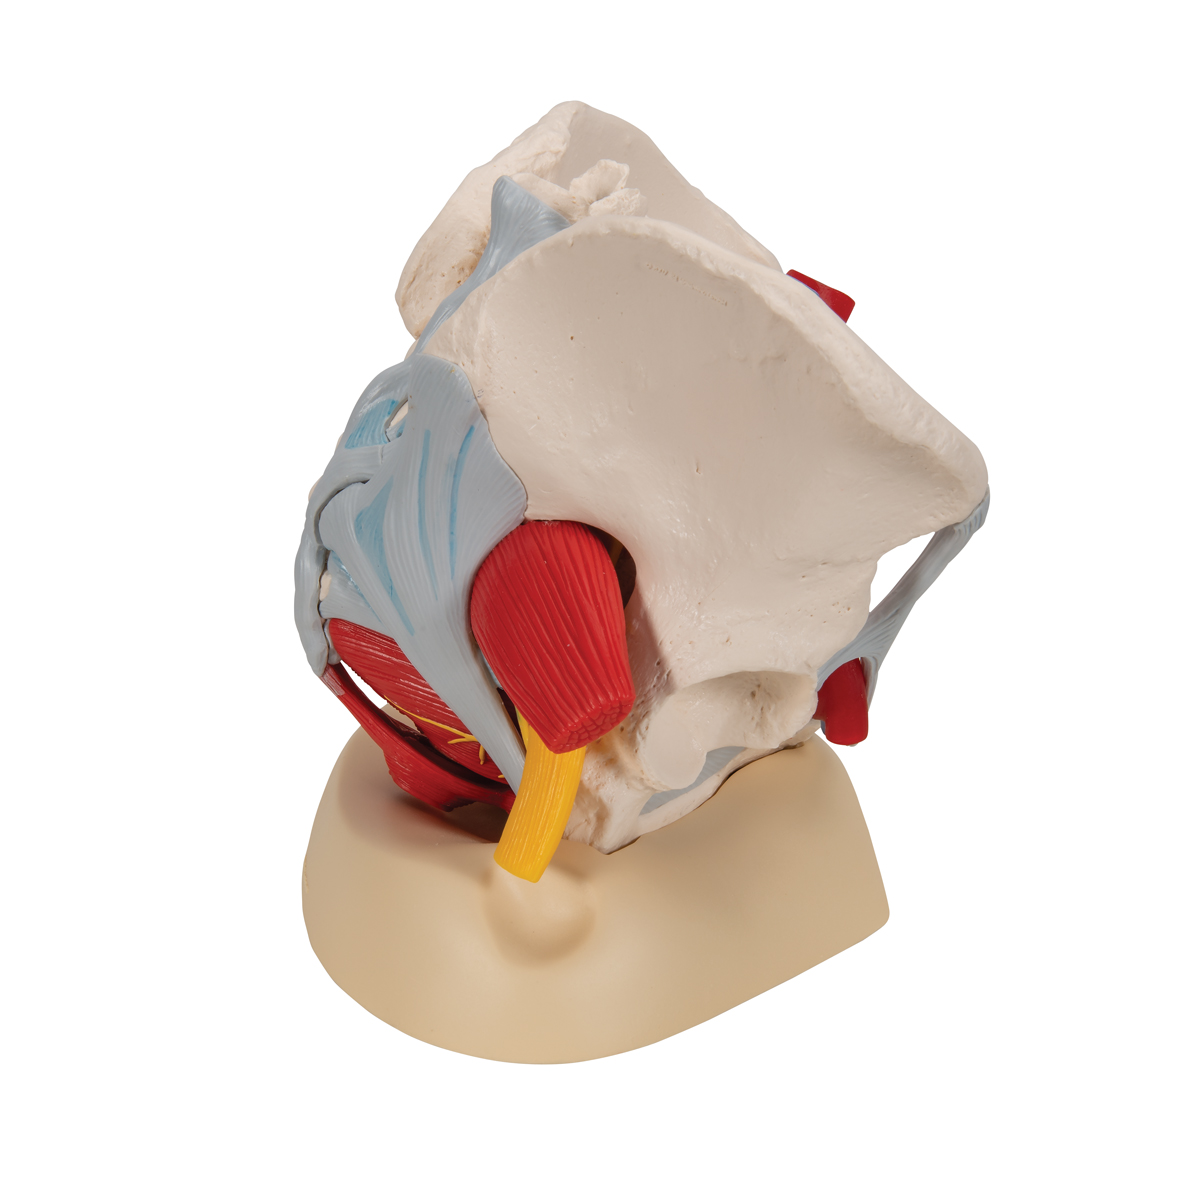 Anatomical Teaching Models Plastic Human Pelvic Models